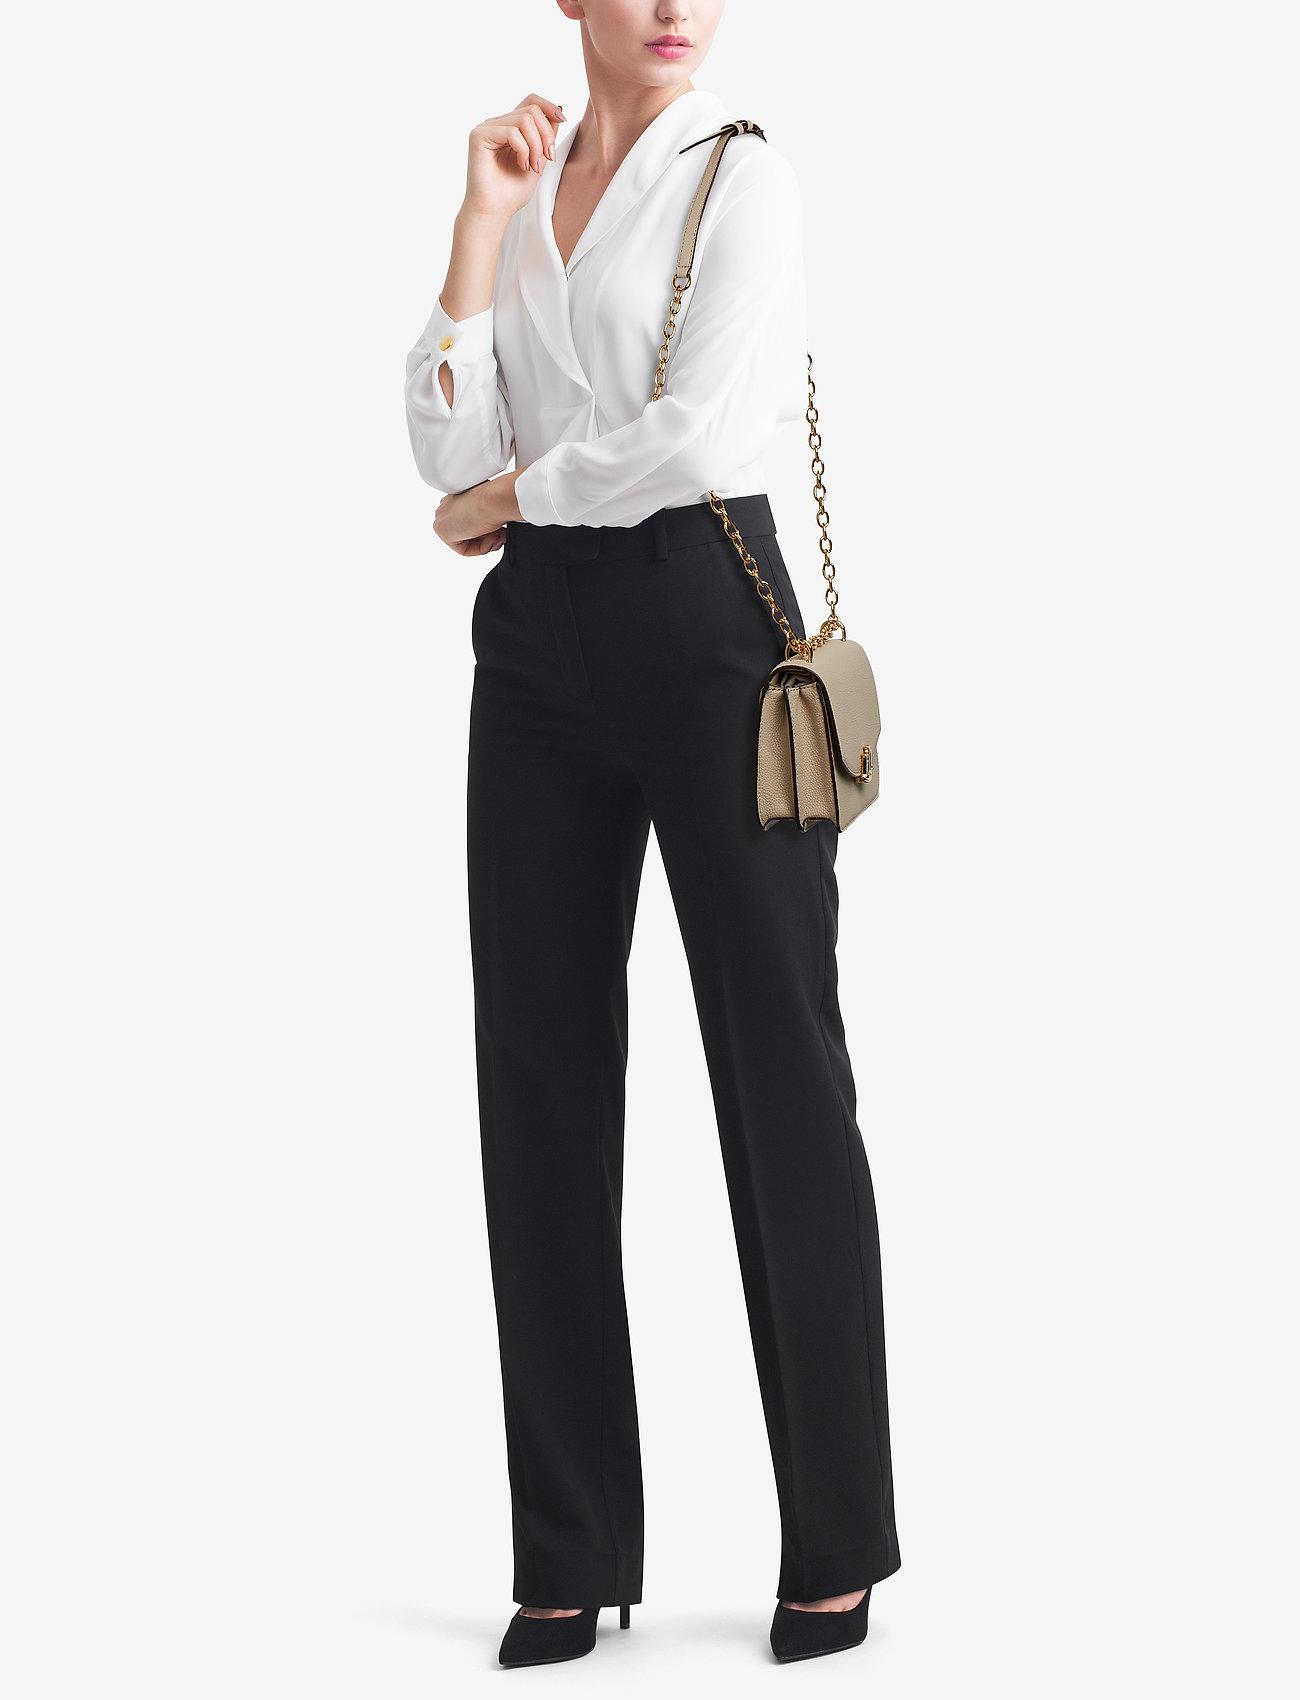 Lauren Ralph Lauren Medium Leather Crossbody Bag - LIGHT SAND